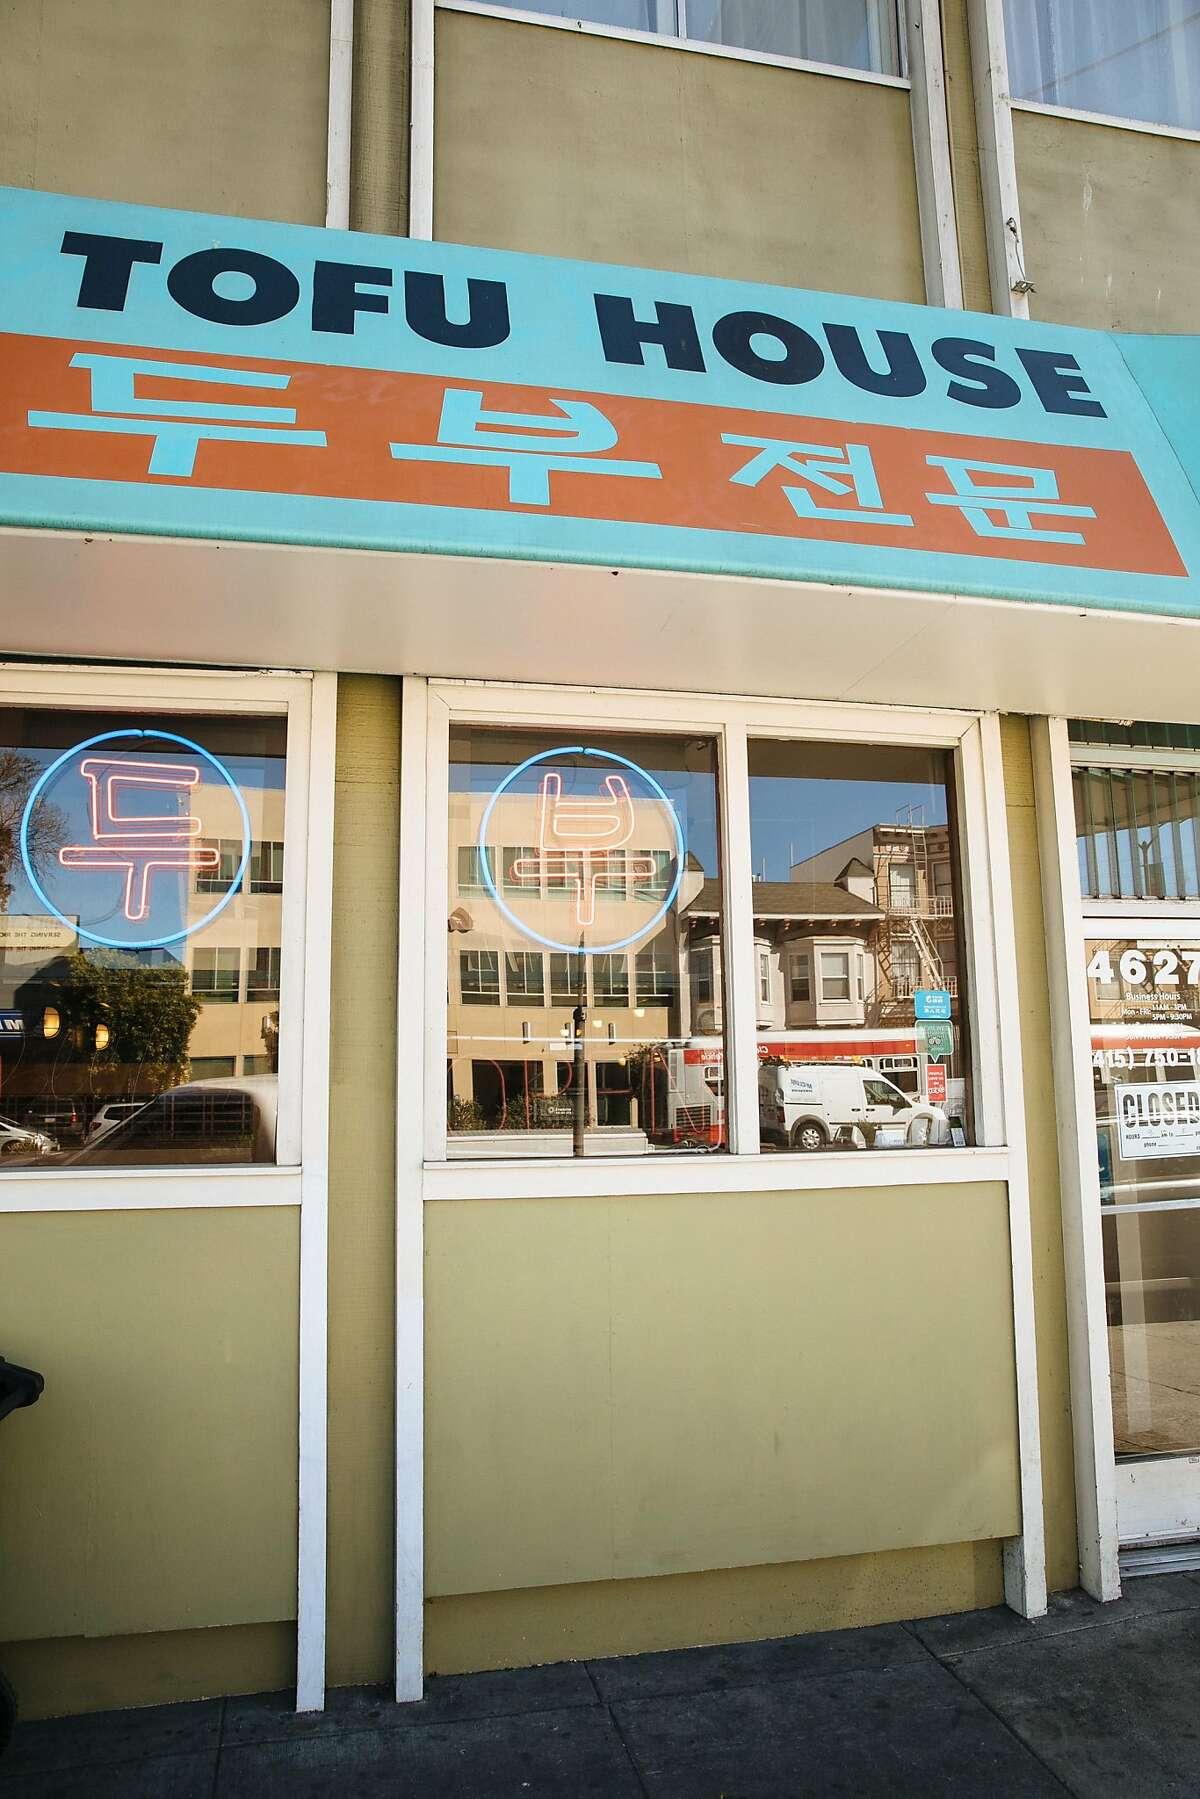 My Tofu House.